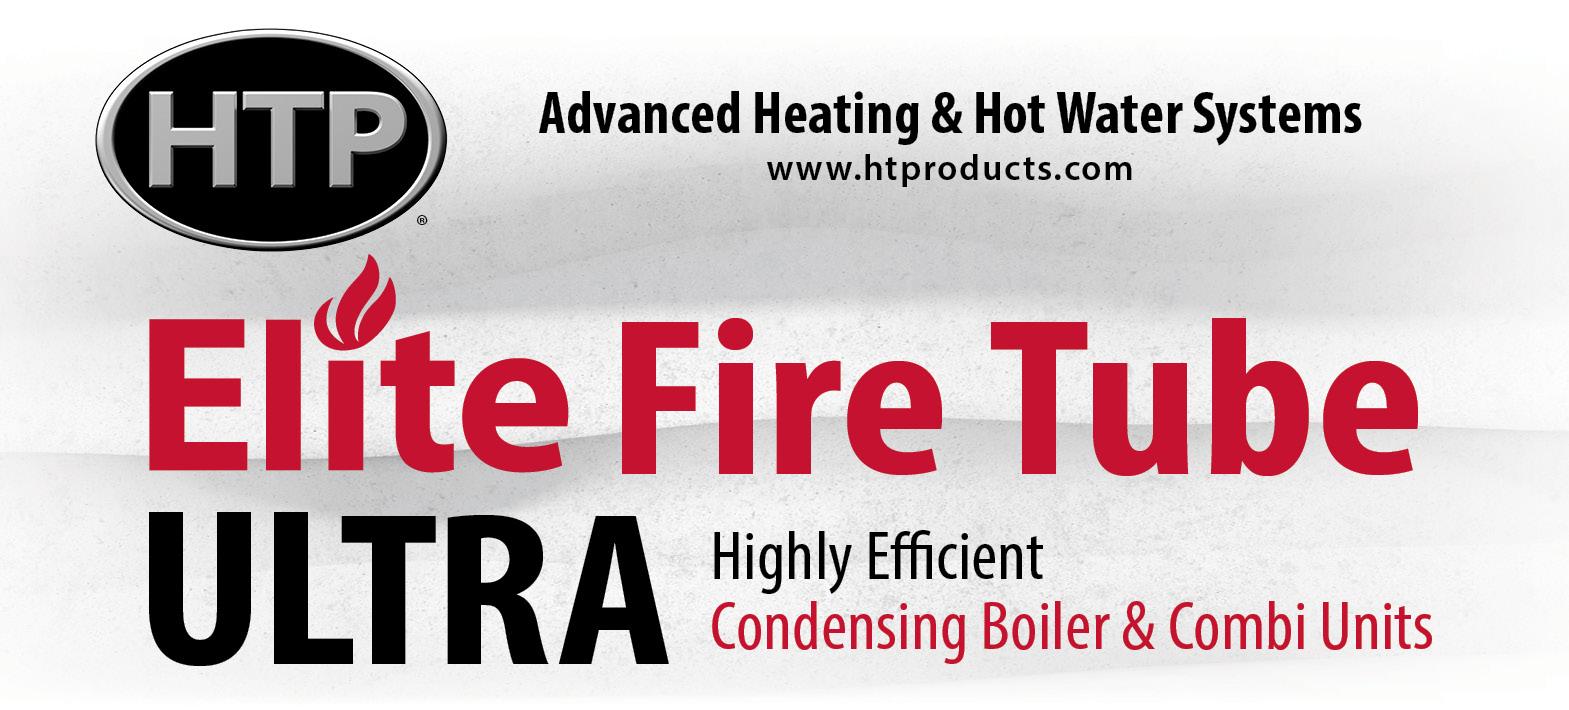 Elite Fire Tube Ultra Efficient Condensing Boiler & Combi